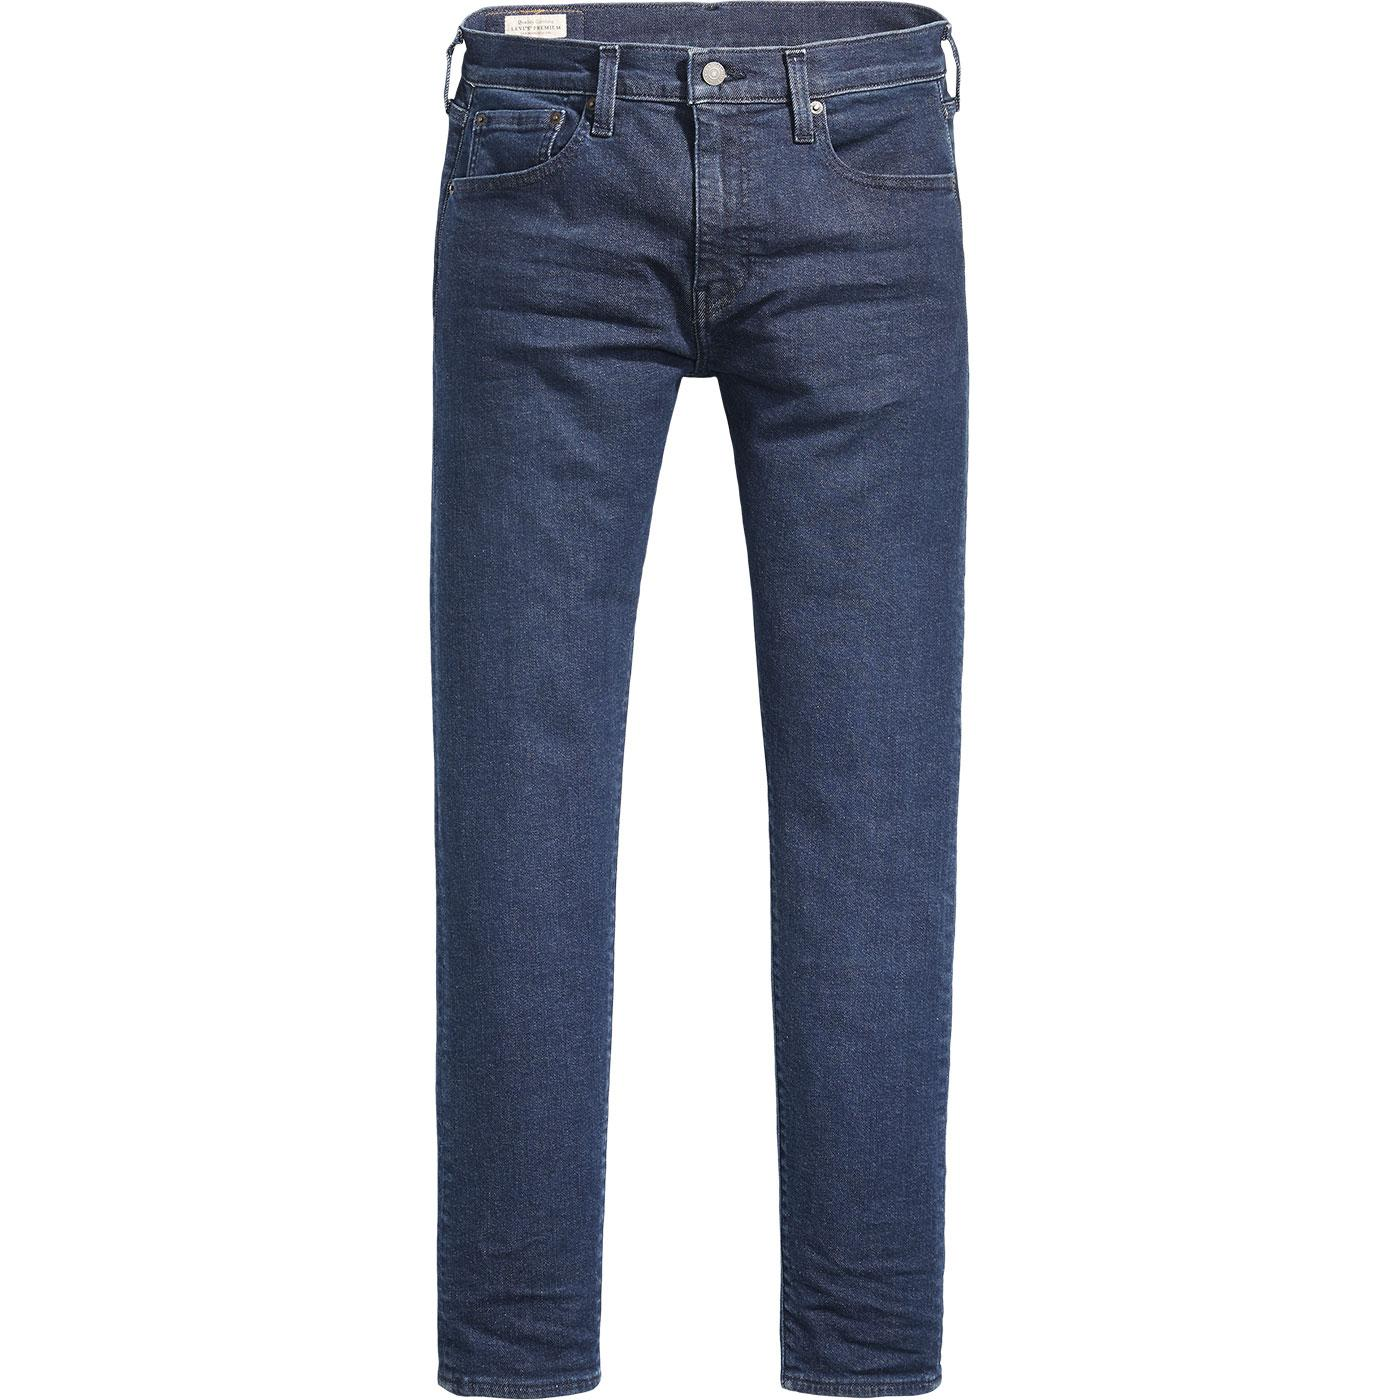 LEVI'S 512 Slim Taper Denim Jeans SAGE NIGHTSHINE